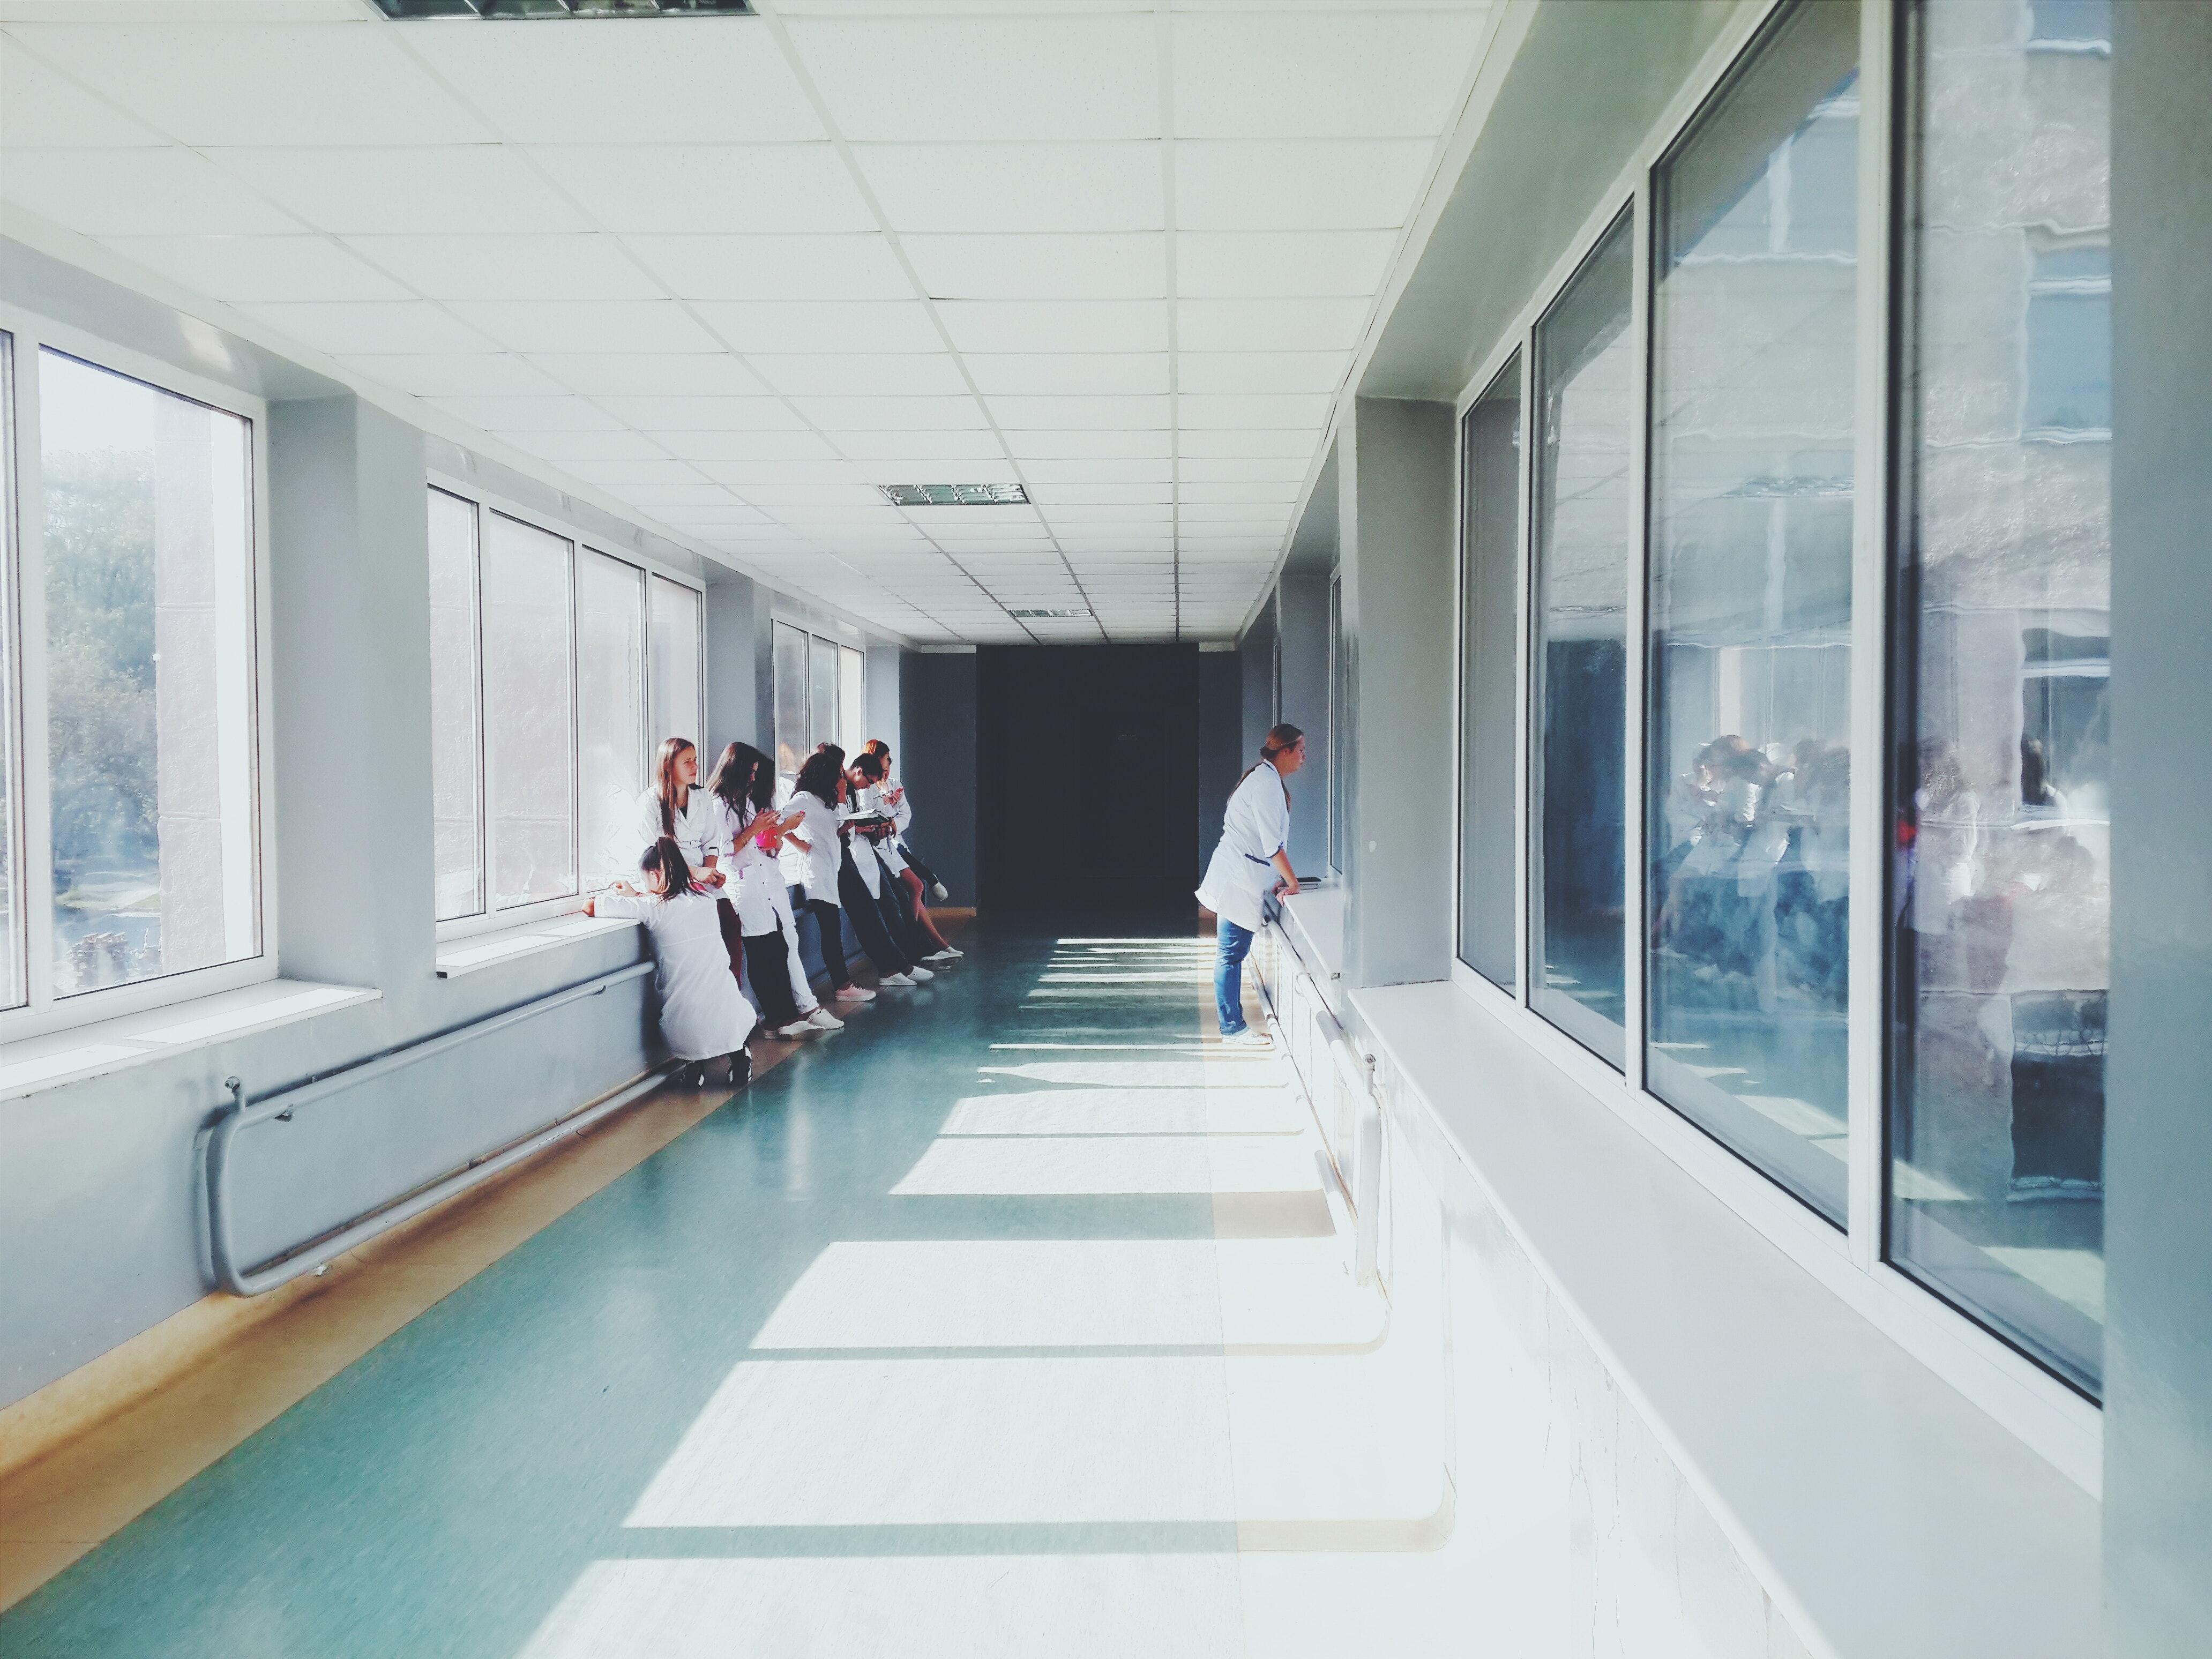 women in a hospital hallway